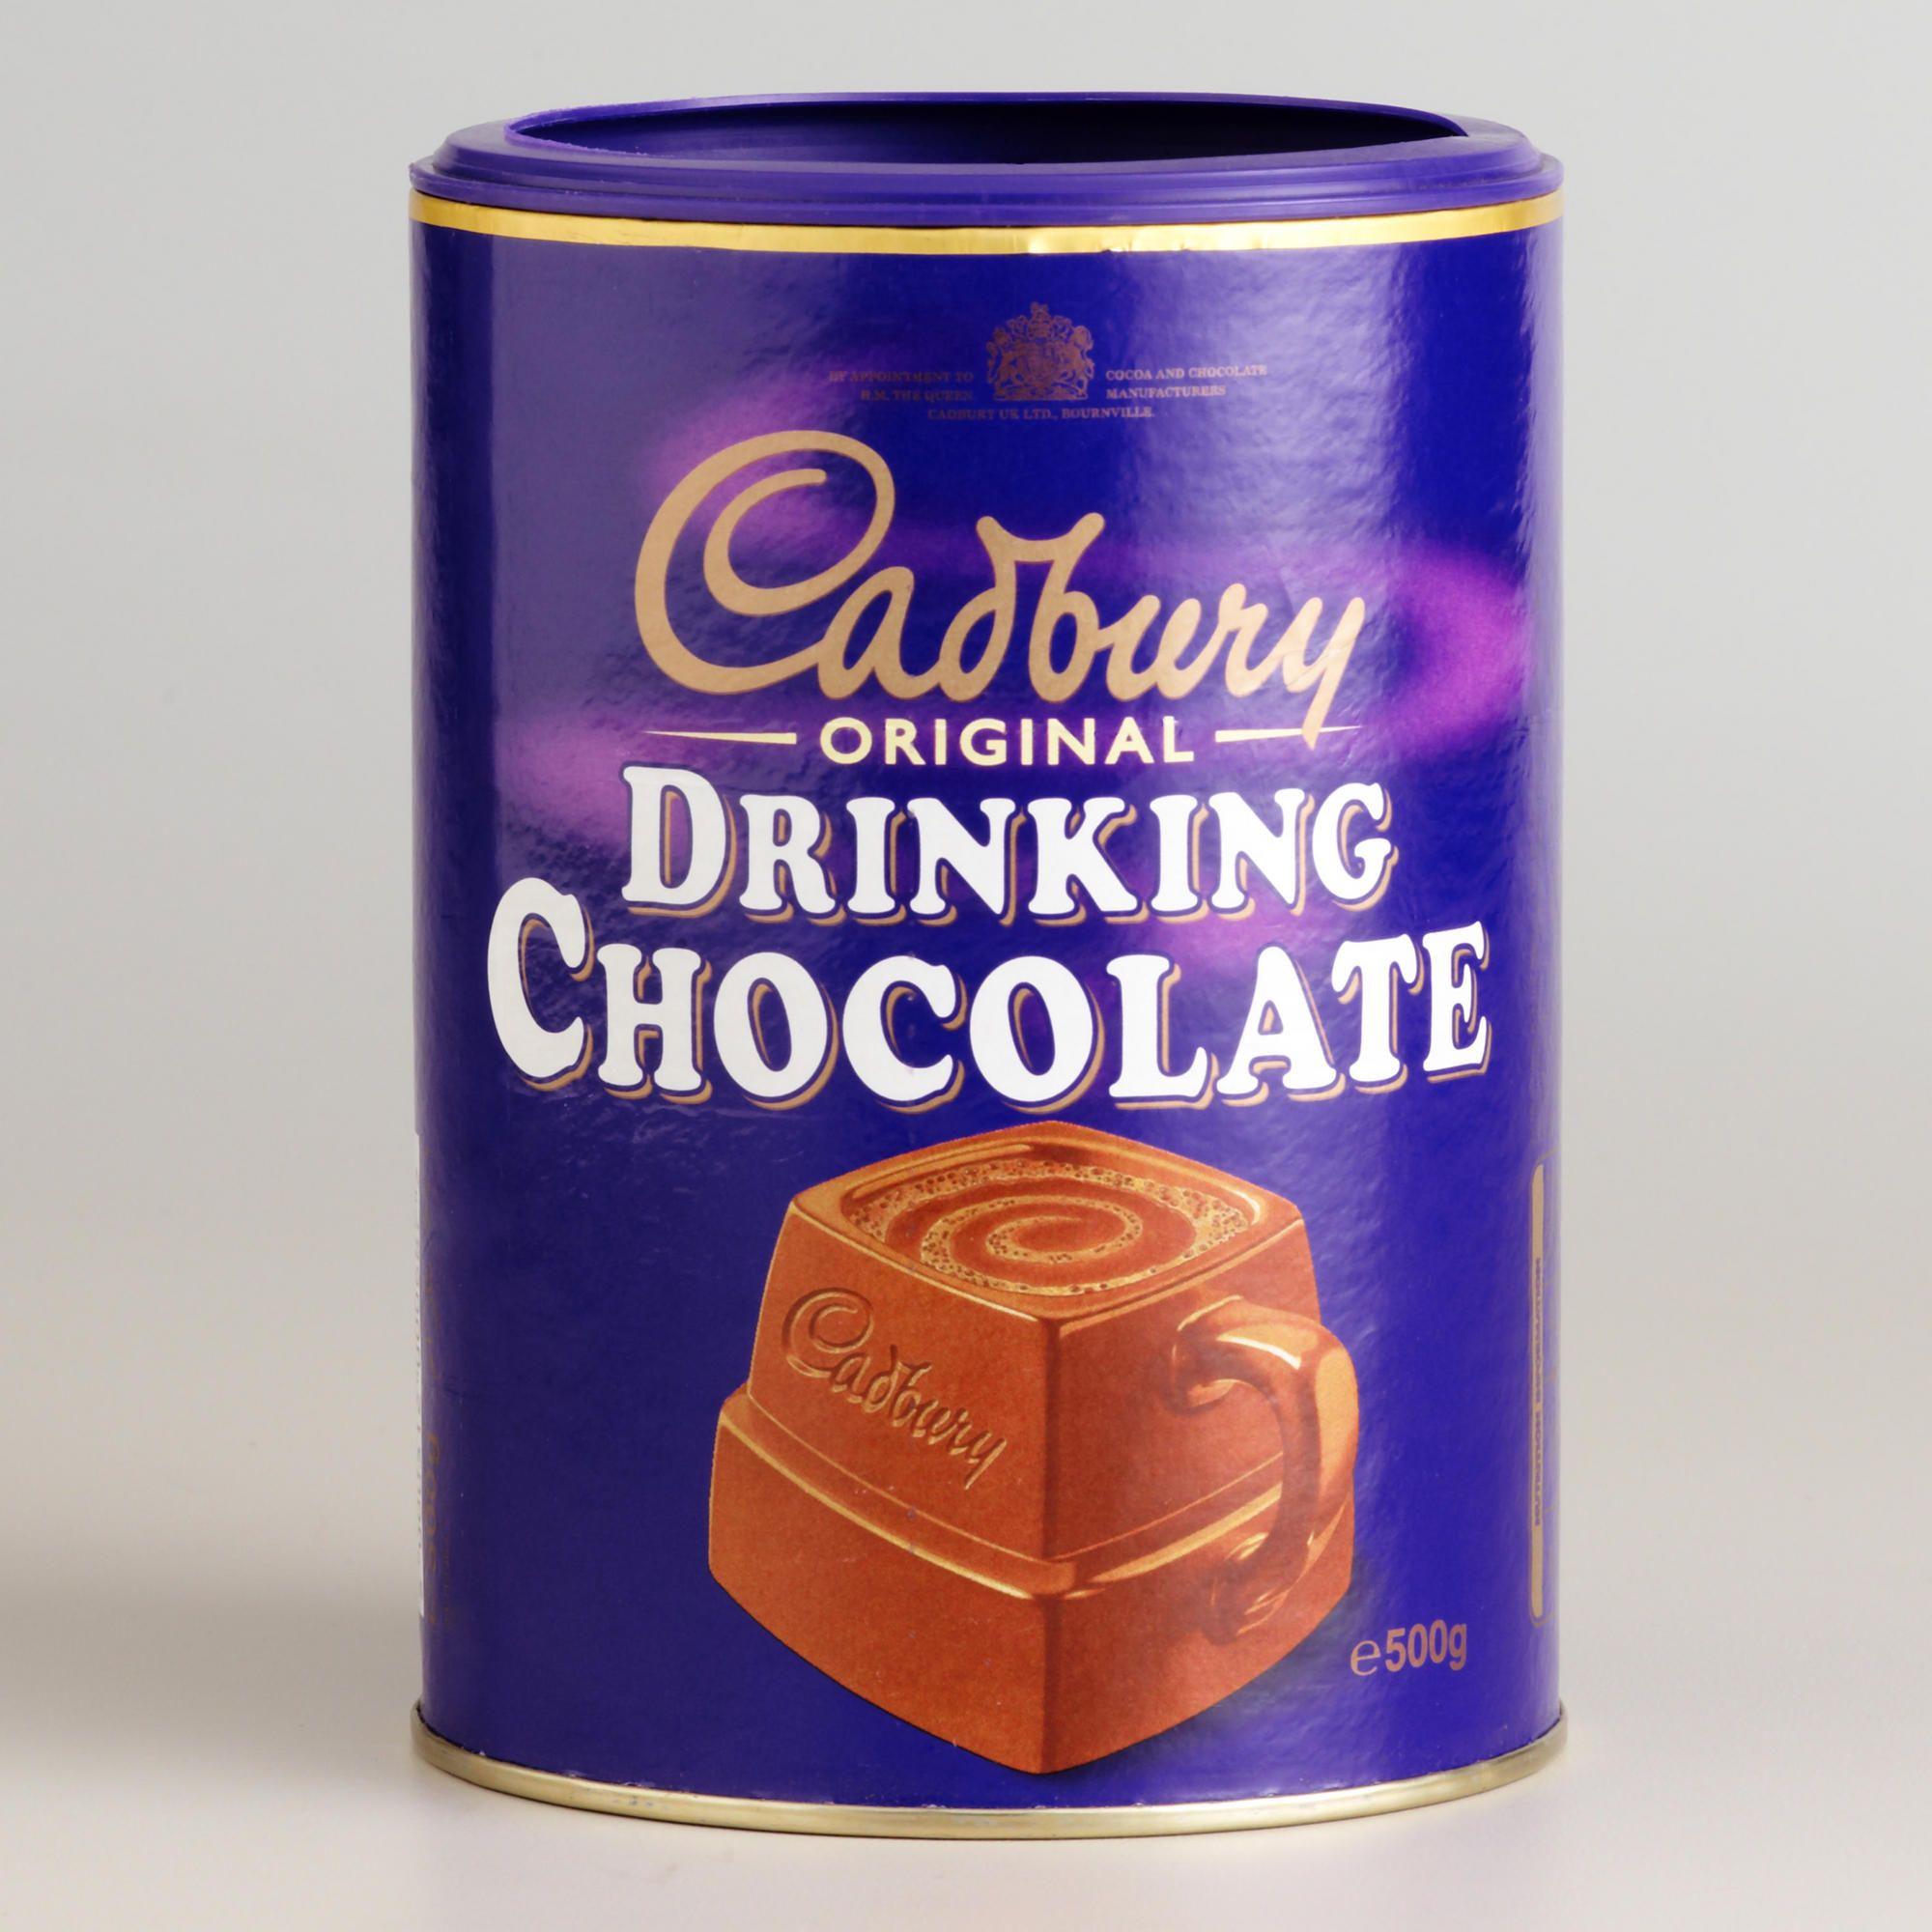 Cadbury Drinking Chocolate-Cadbury Drinking Chocolate   World ...